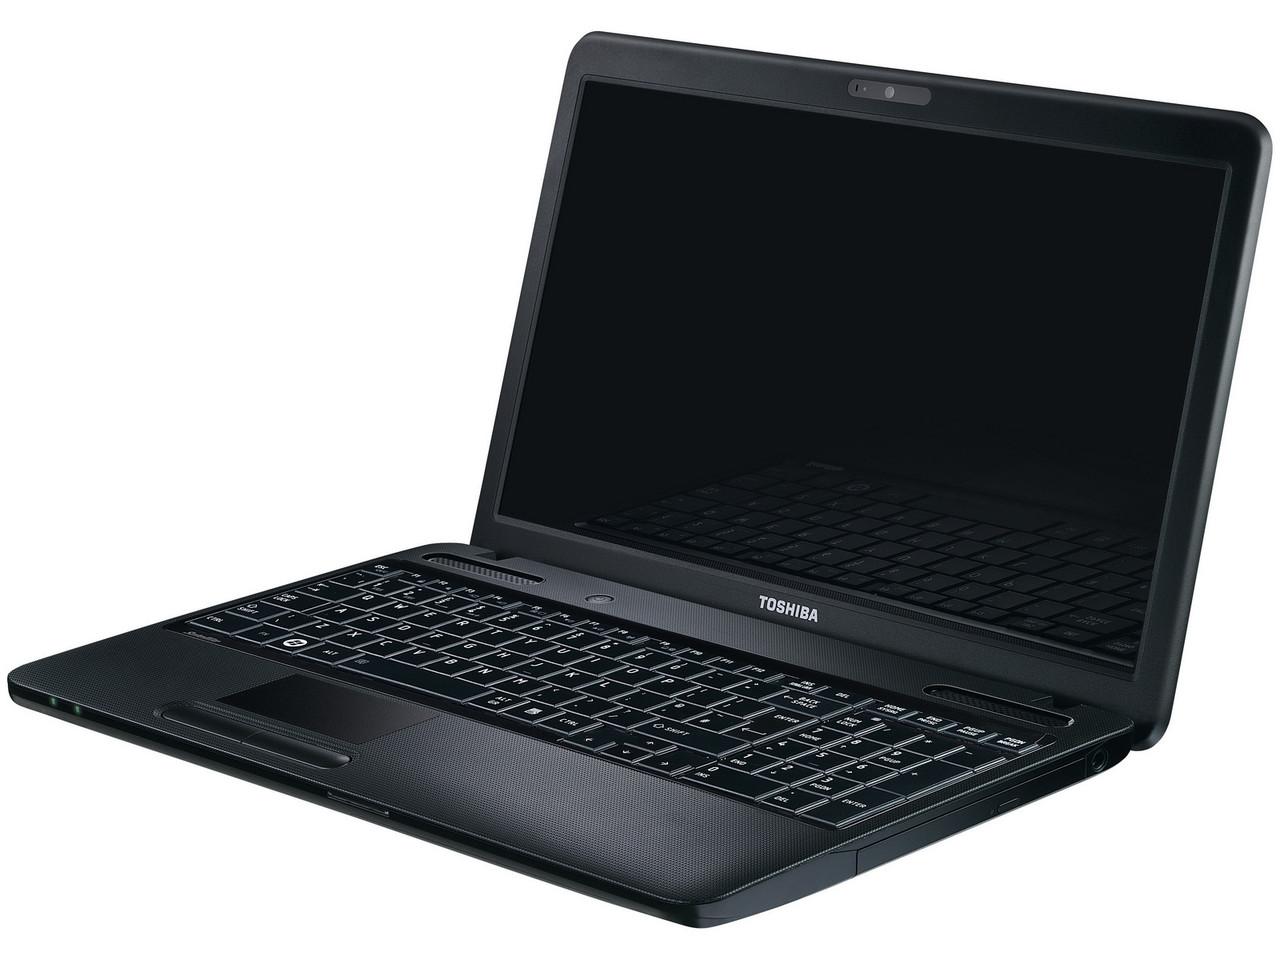 НОУТБУК, NOTEBOOK, Toshiba Satellite C670, Intel Pentium B950 2 ЯДРА 2 ПОТОКА ПО 2.1 ГГЦ, 8 ГБ ОЗУ, HDD 640 ГБ